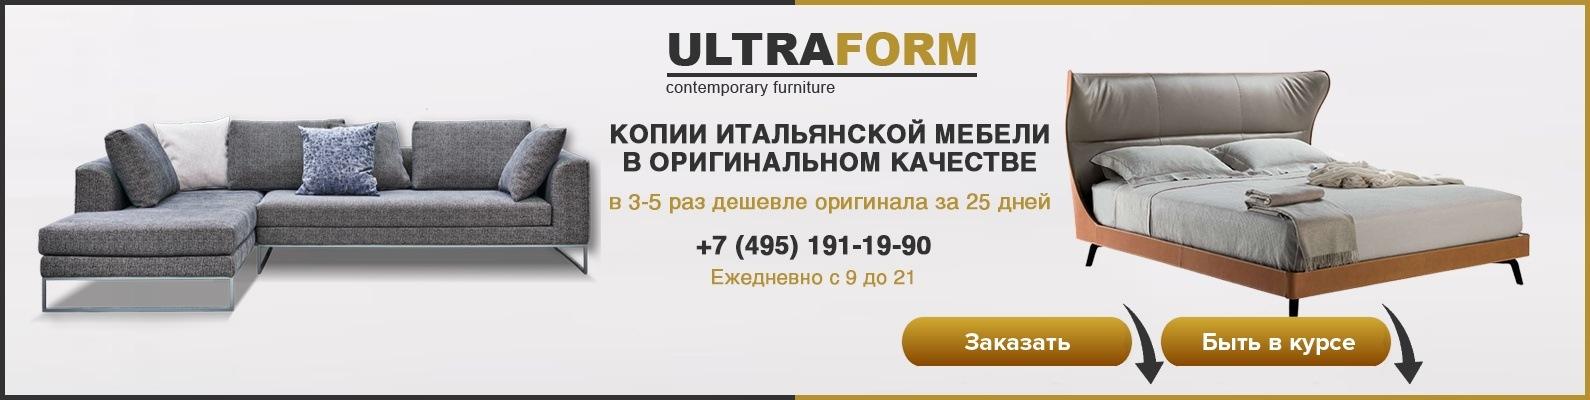 Ultraform диваны отзывы